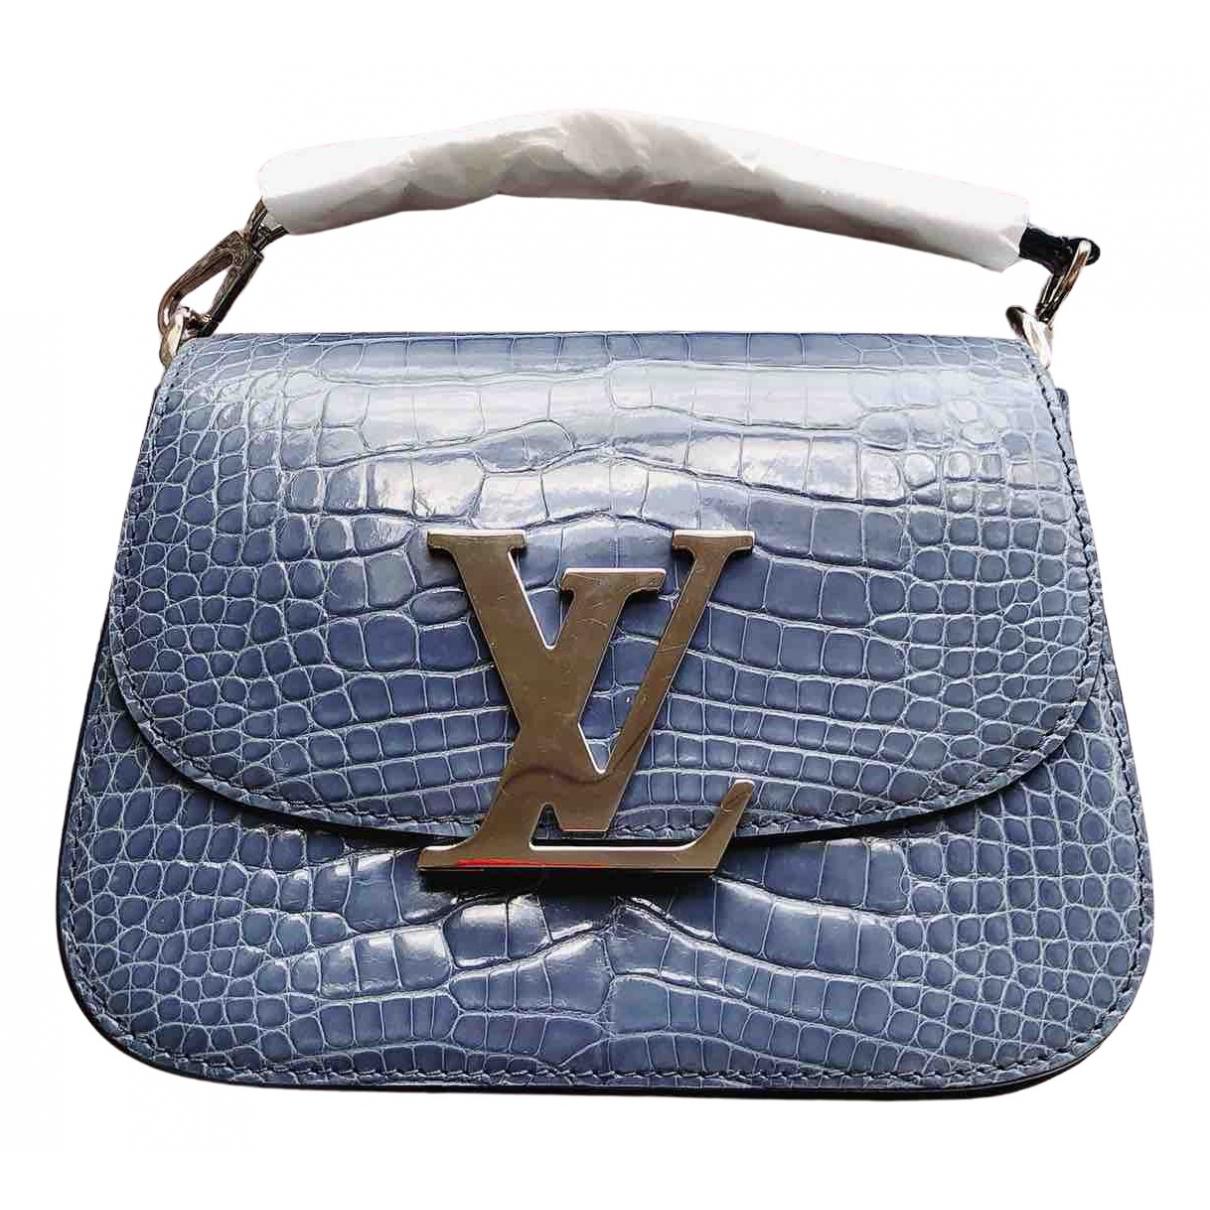 Louis Vuitton - Sac a main   pour femme en crocodile - bleu